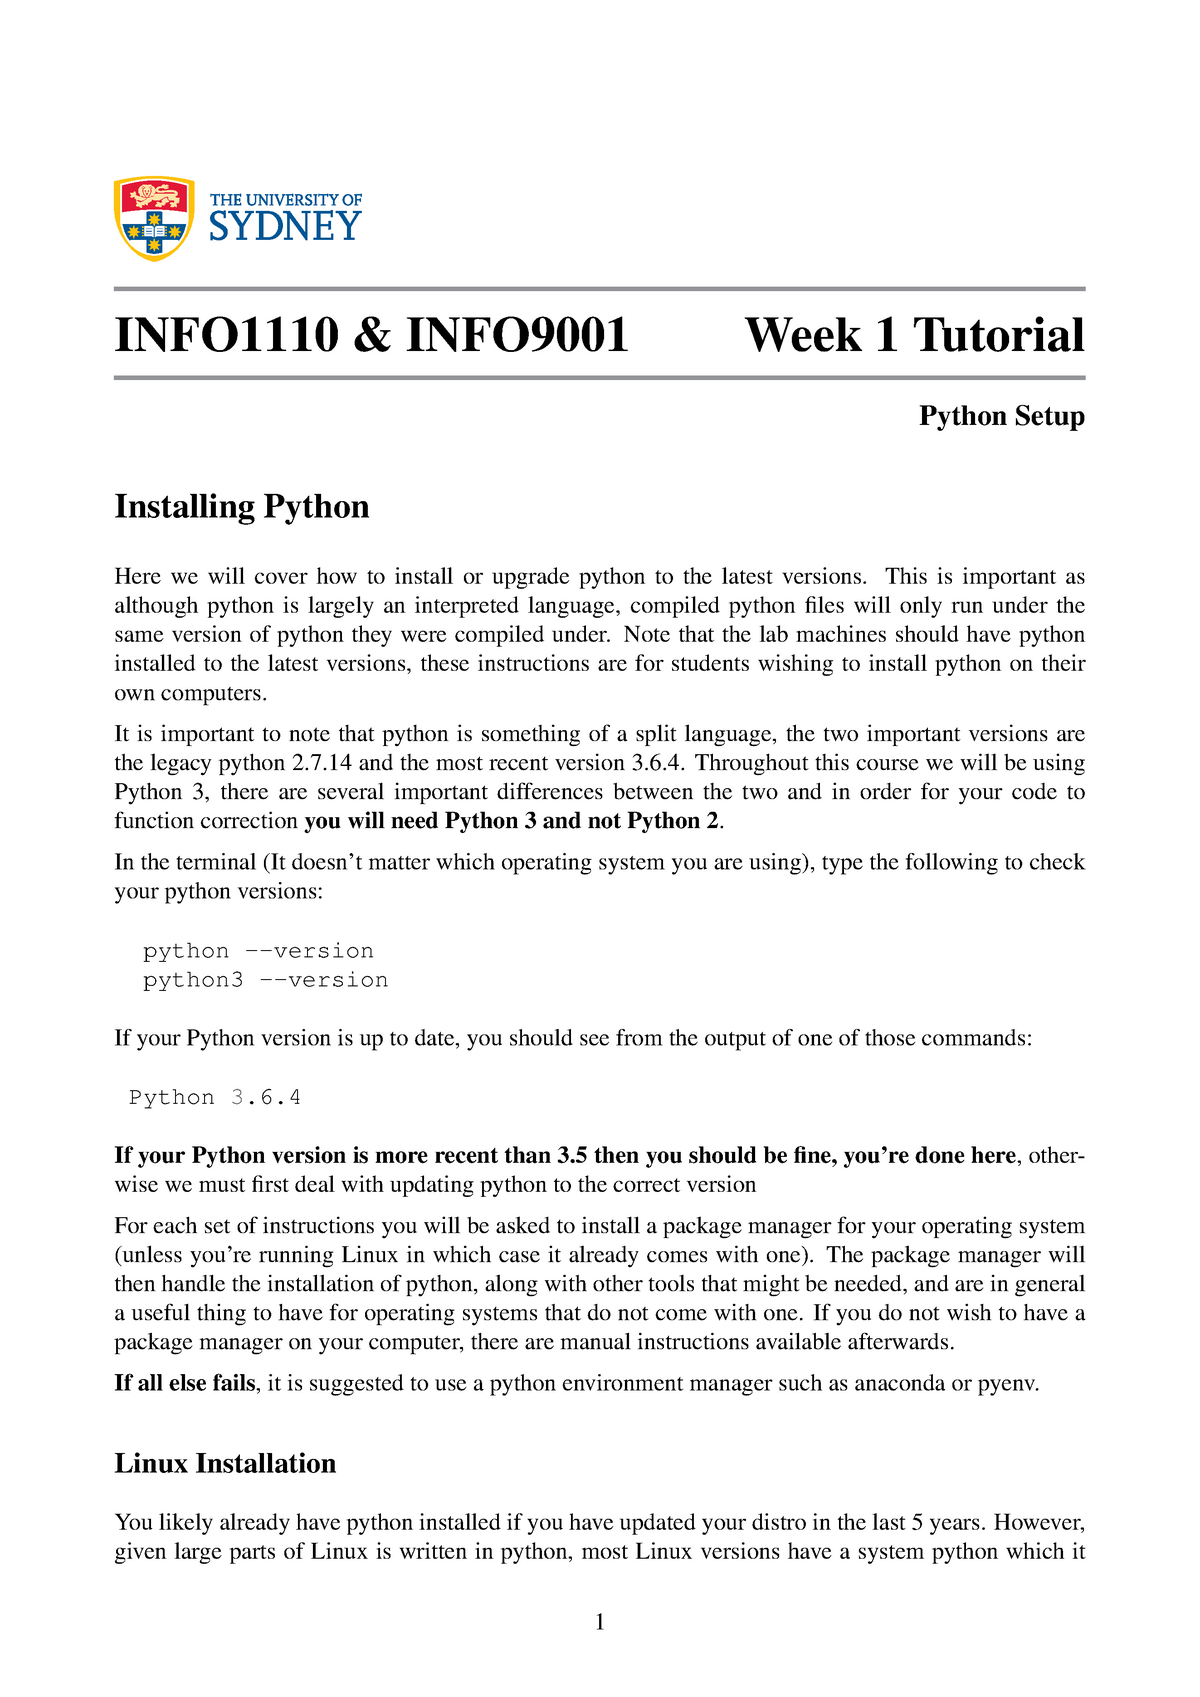 Python Setup Guide - Info1110 INFO1110 - StuDocu